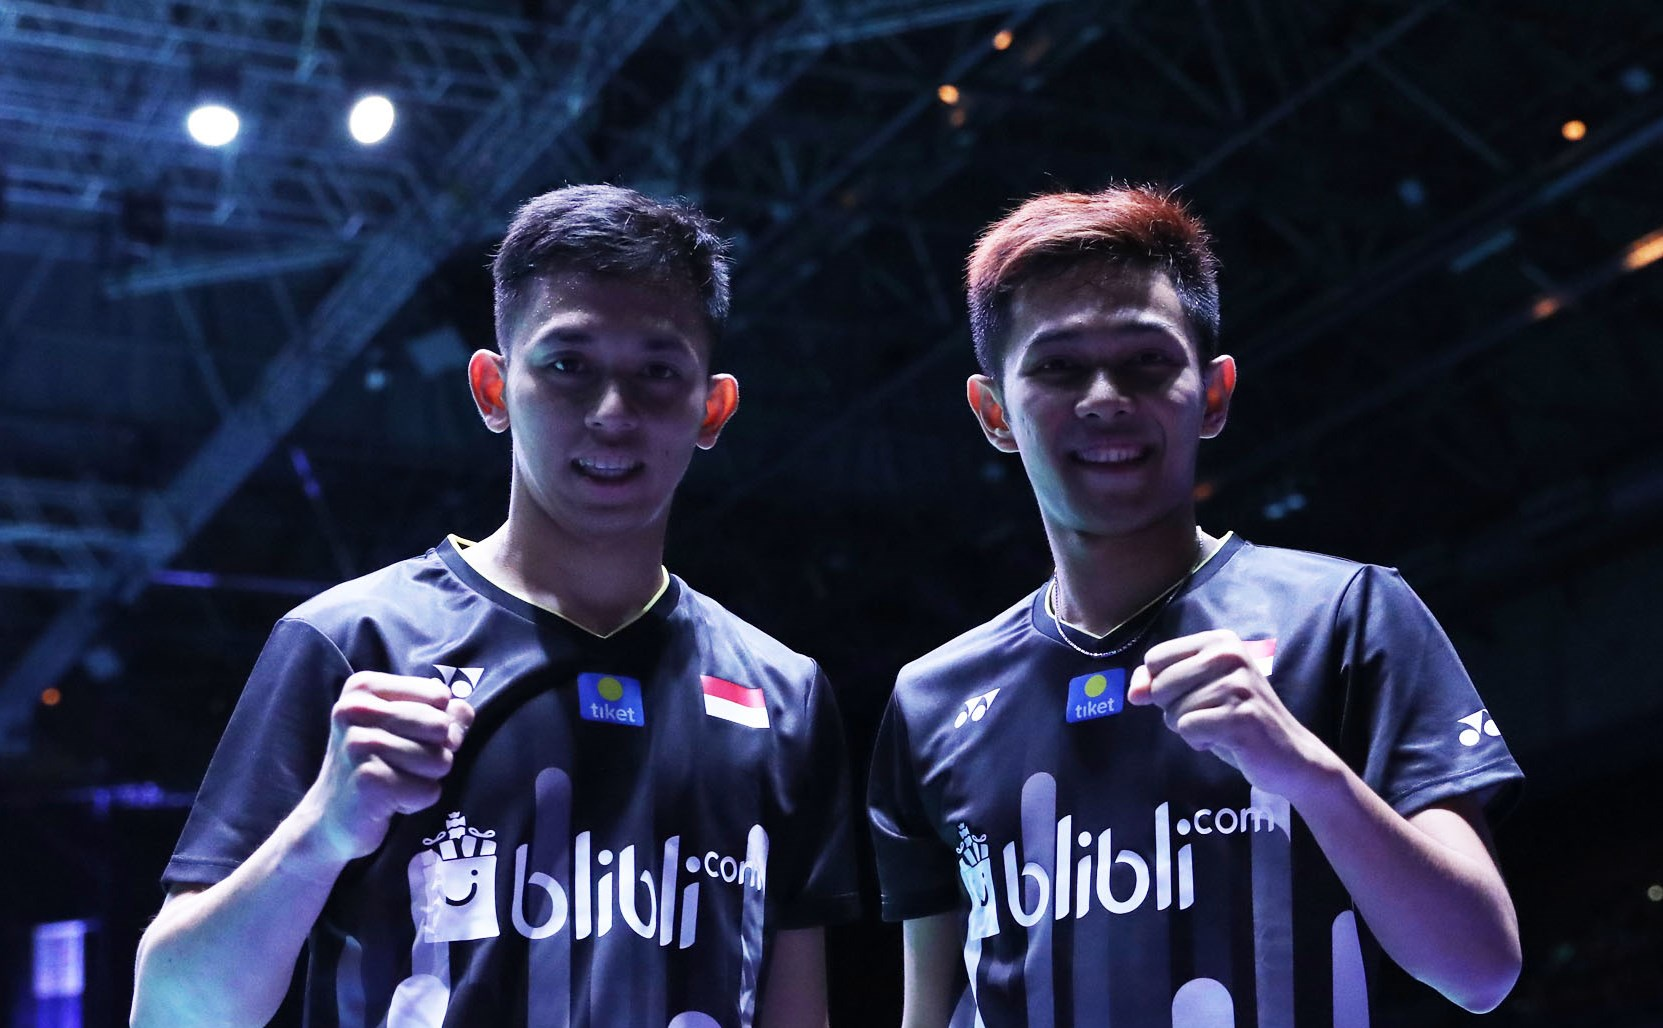 https: img-o.okeinfo.net content 2019 03 09 40 2027725 jadwal-wakil-indonesia-di-semifinal-all-england-2019-WwiBhMKkC7.jpg